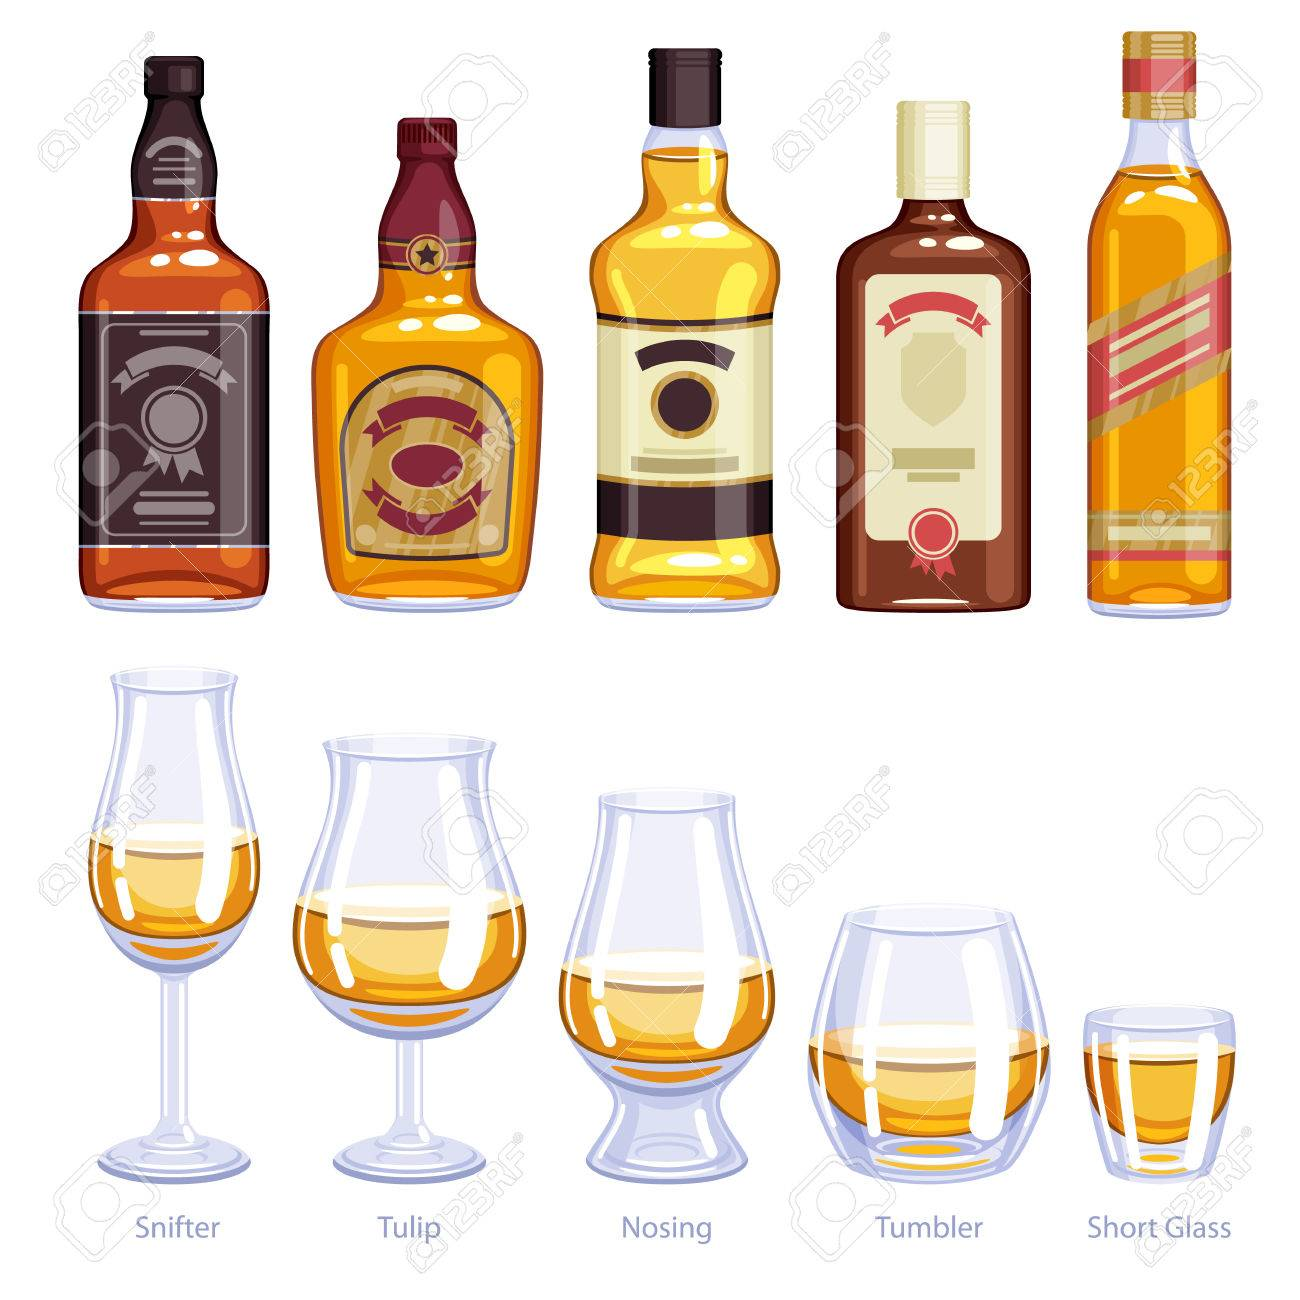 Whisky bottles and glusses icons set. Alcohol vector illustration. Snifter, tulip, nosing, tumbler, short glasses - 62794994